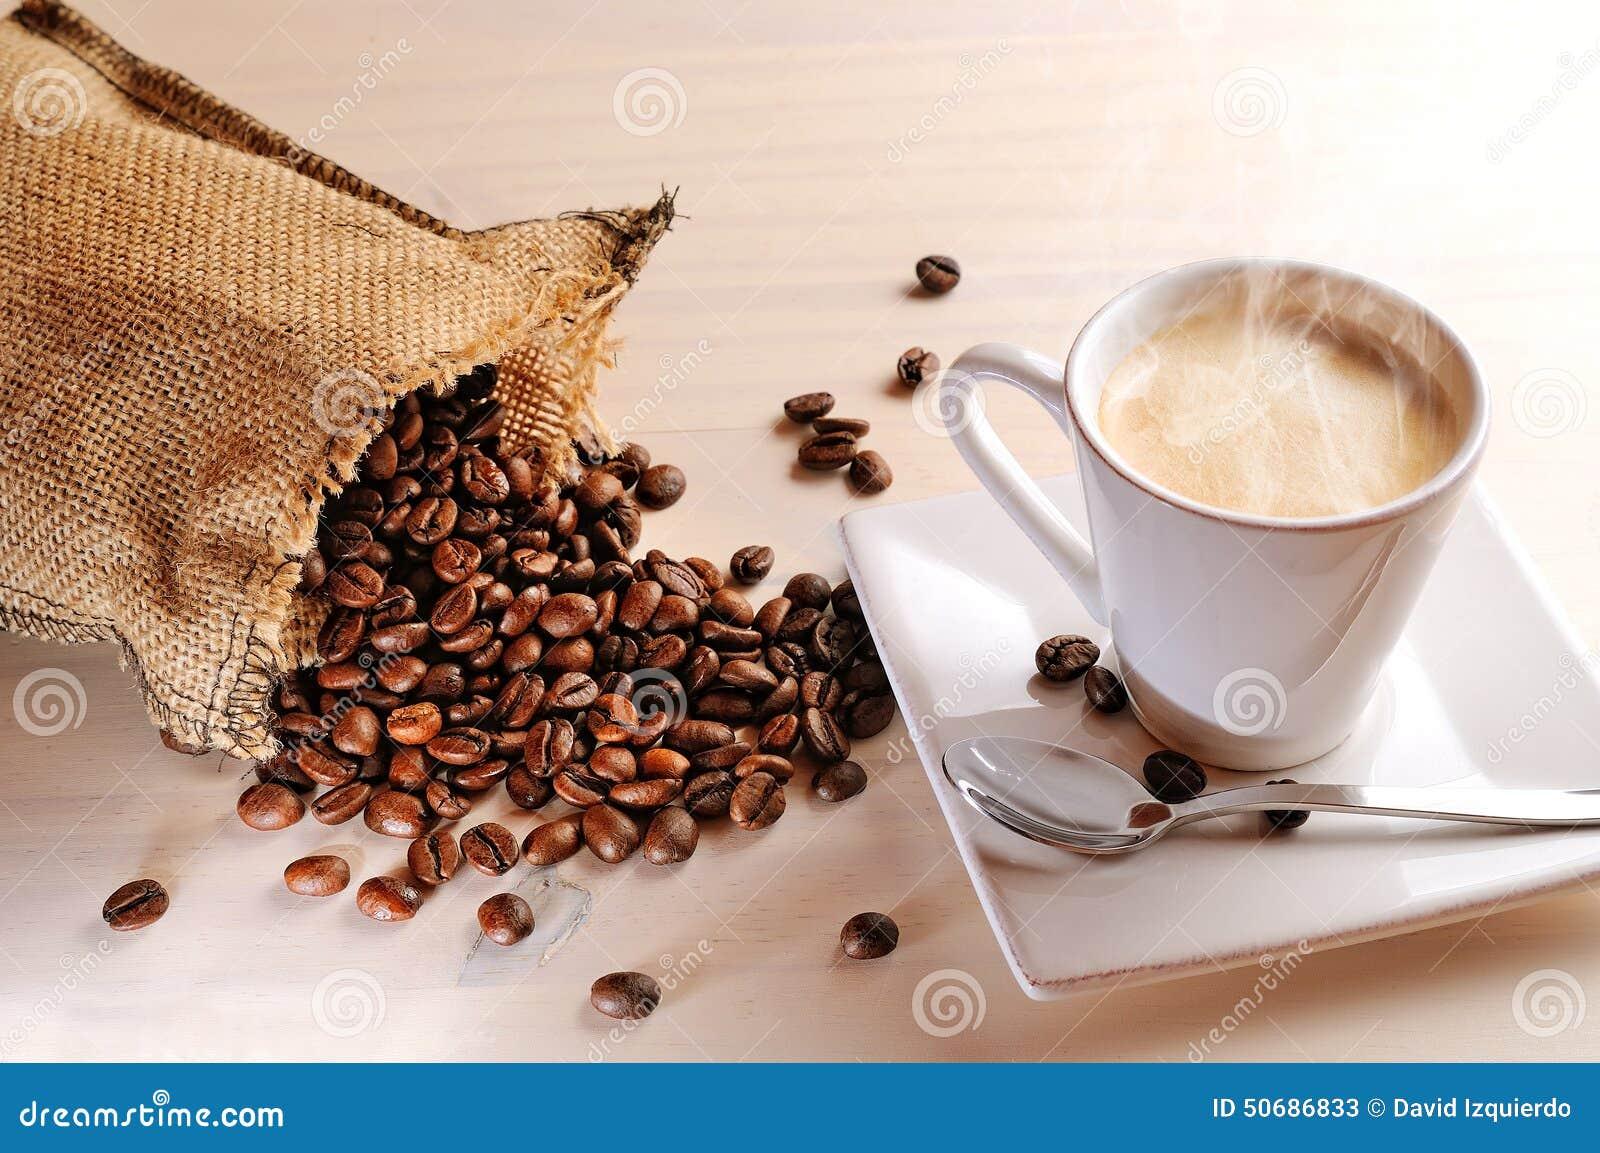 Download 杯在桌和大袋上的热的咖啡用咖啡豆 库存图片. 图片 包括有 咖啡馆, 脱咖啡因咖啡, 杯子, 阿诺德, latte - 50686833